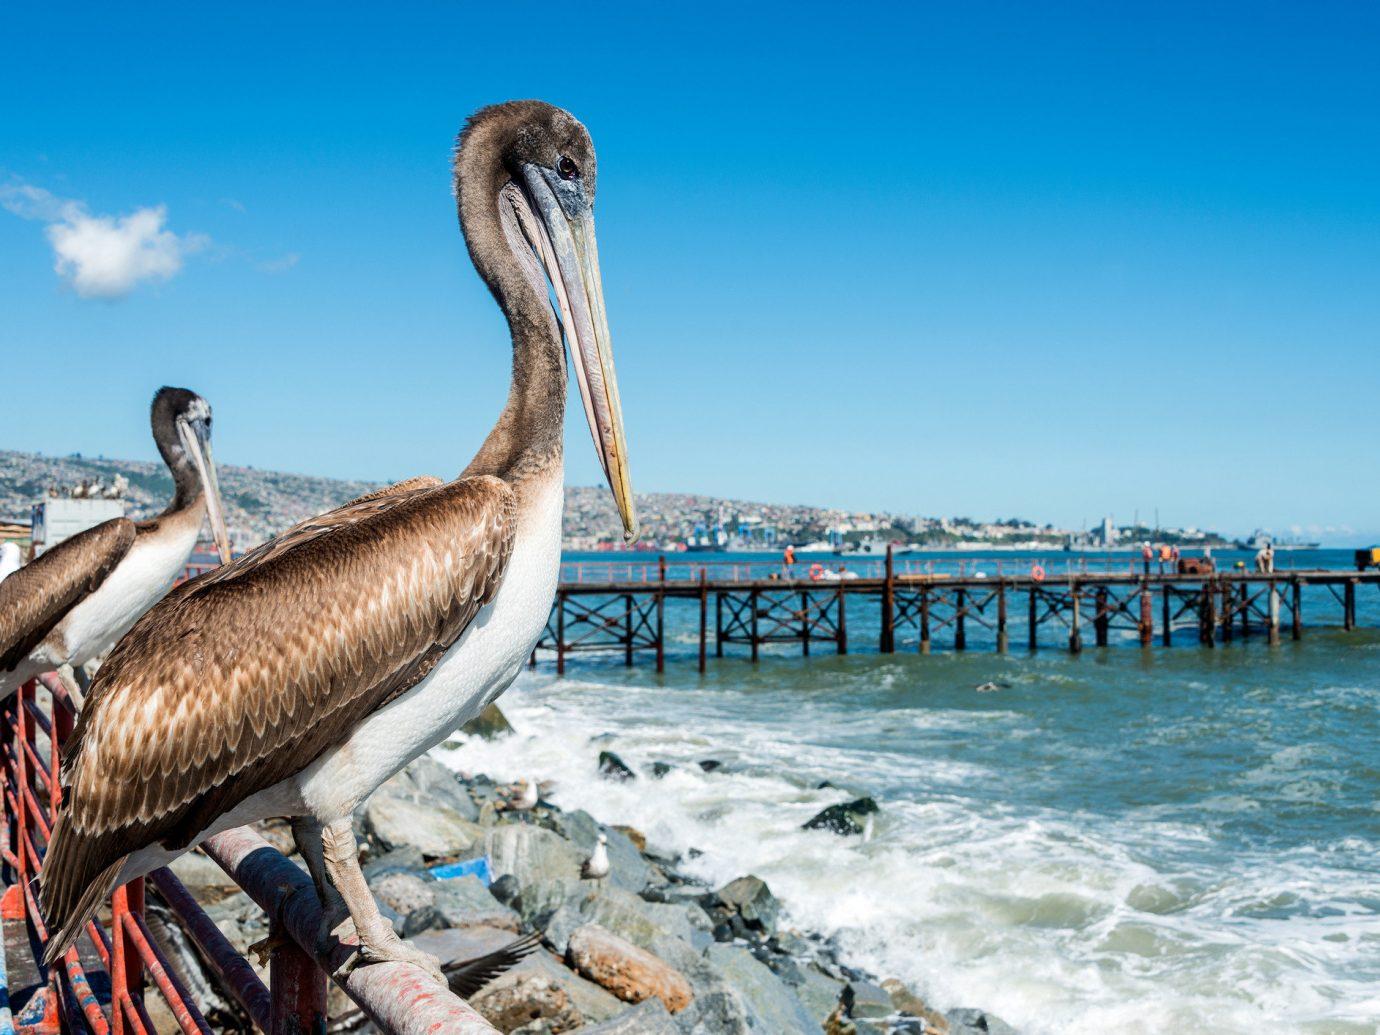 Trip Ideas sky outdoor Bird water pelican pier standing animal fauna vacation aquatic bird Sea seabird railing sandy